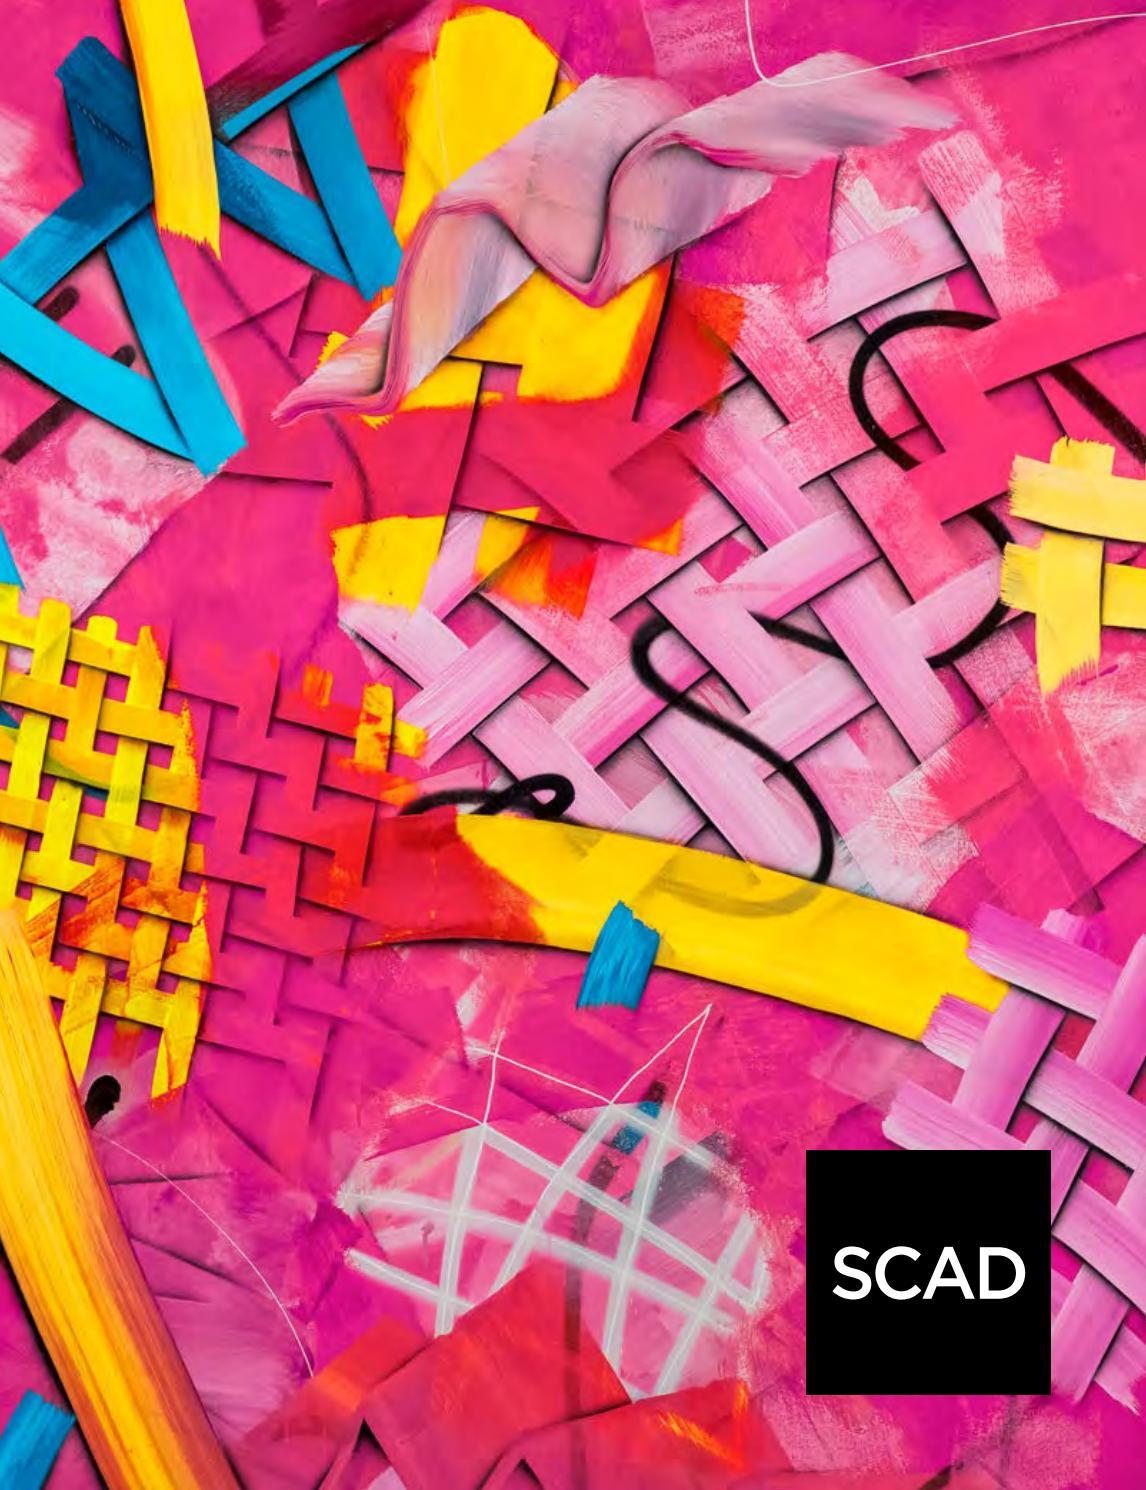 SCAD 2019-20 academic catalog by SCAD - issuu